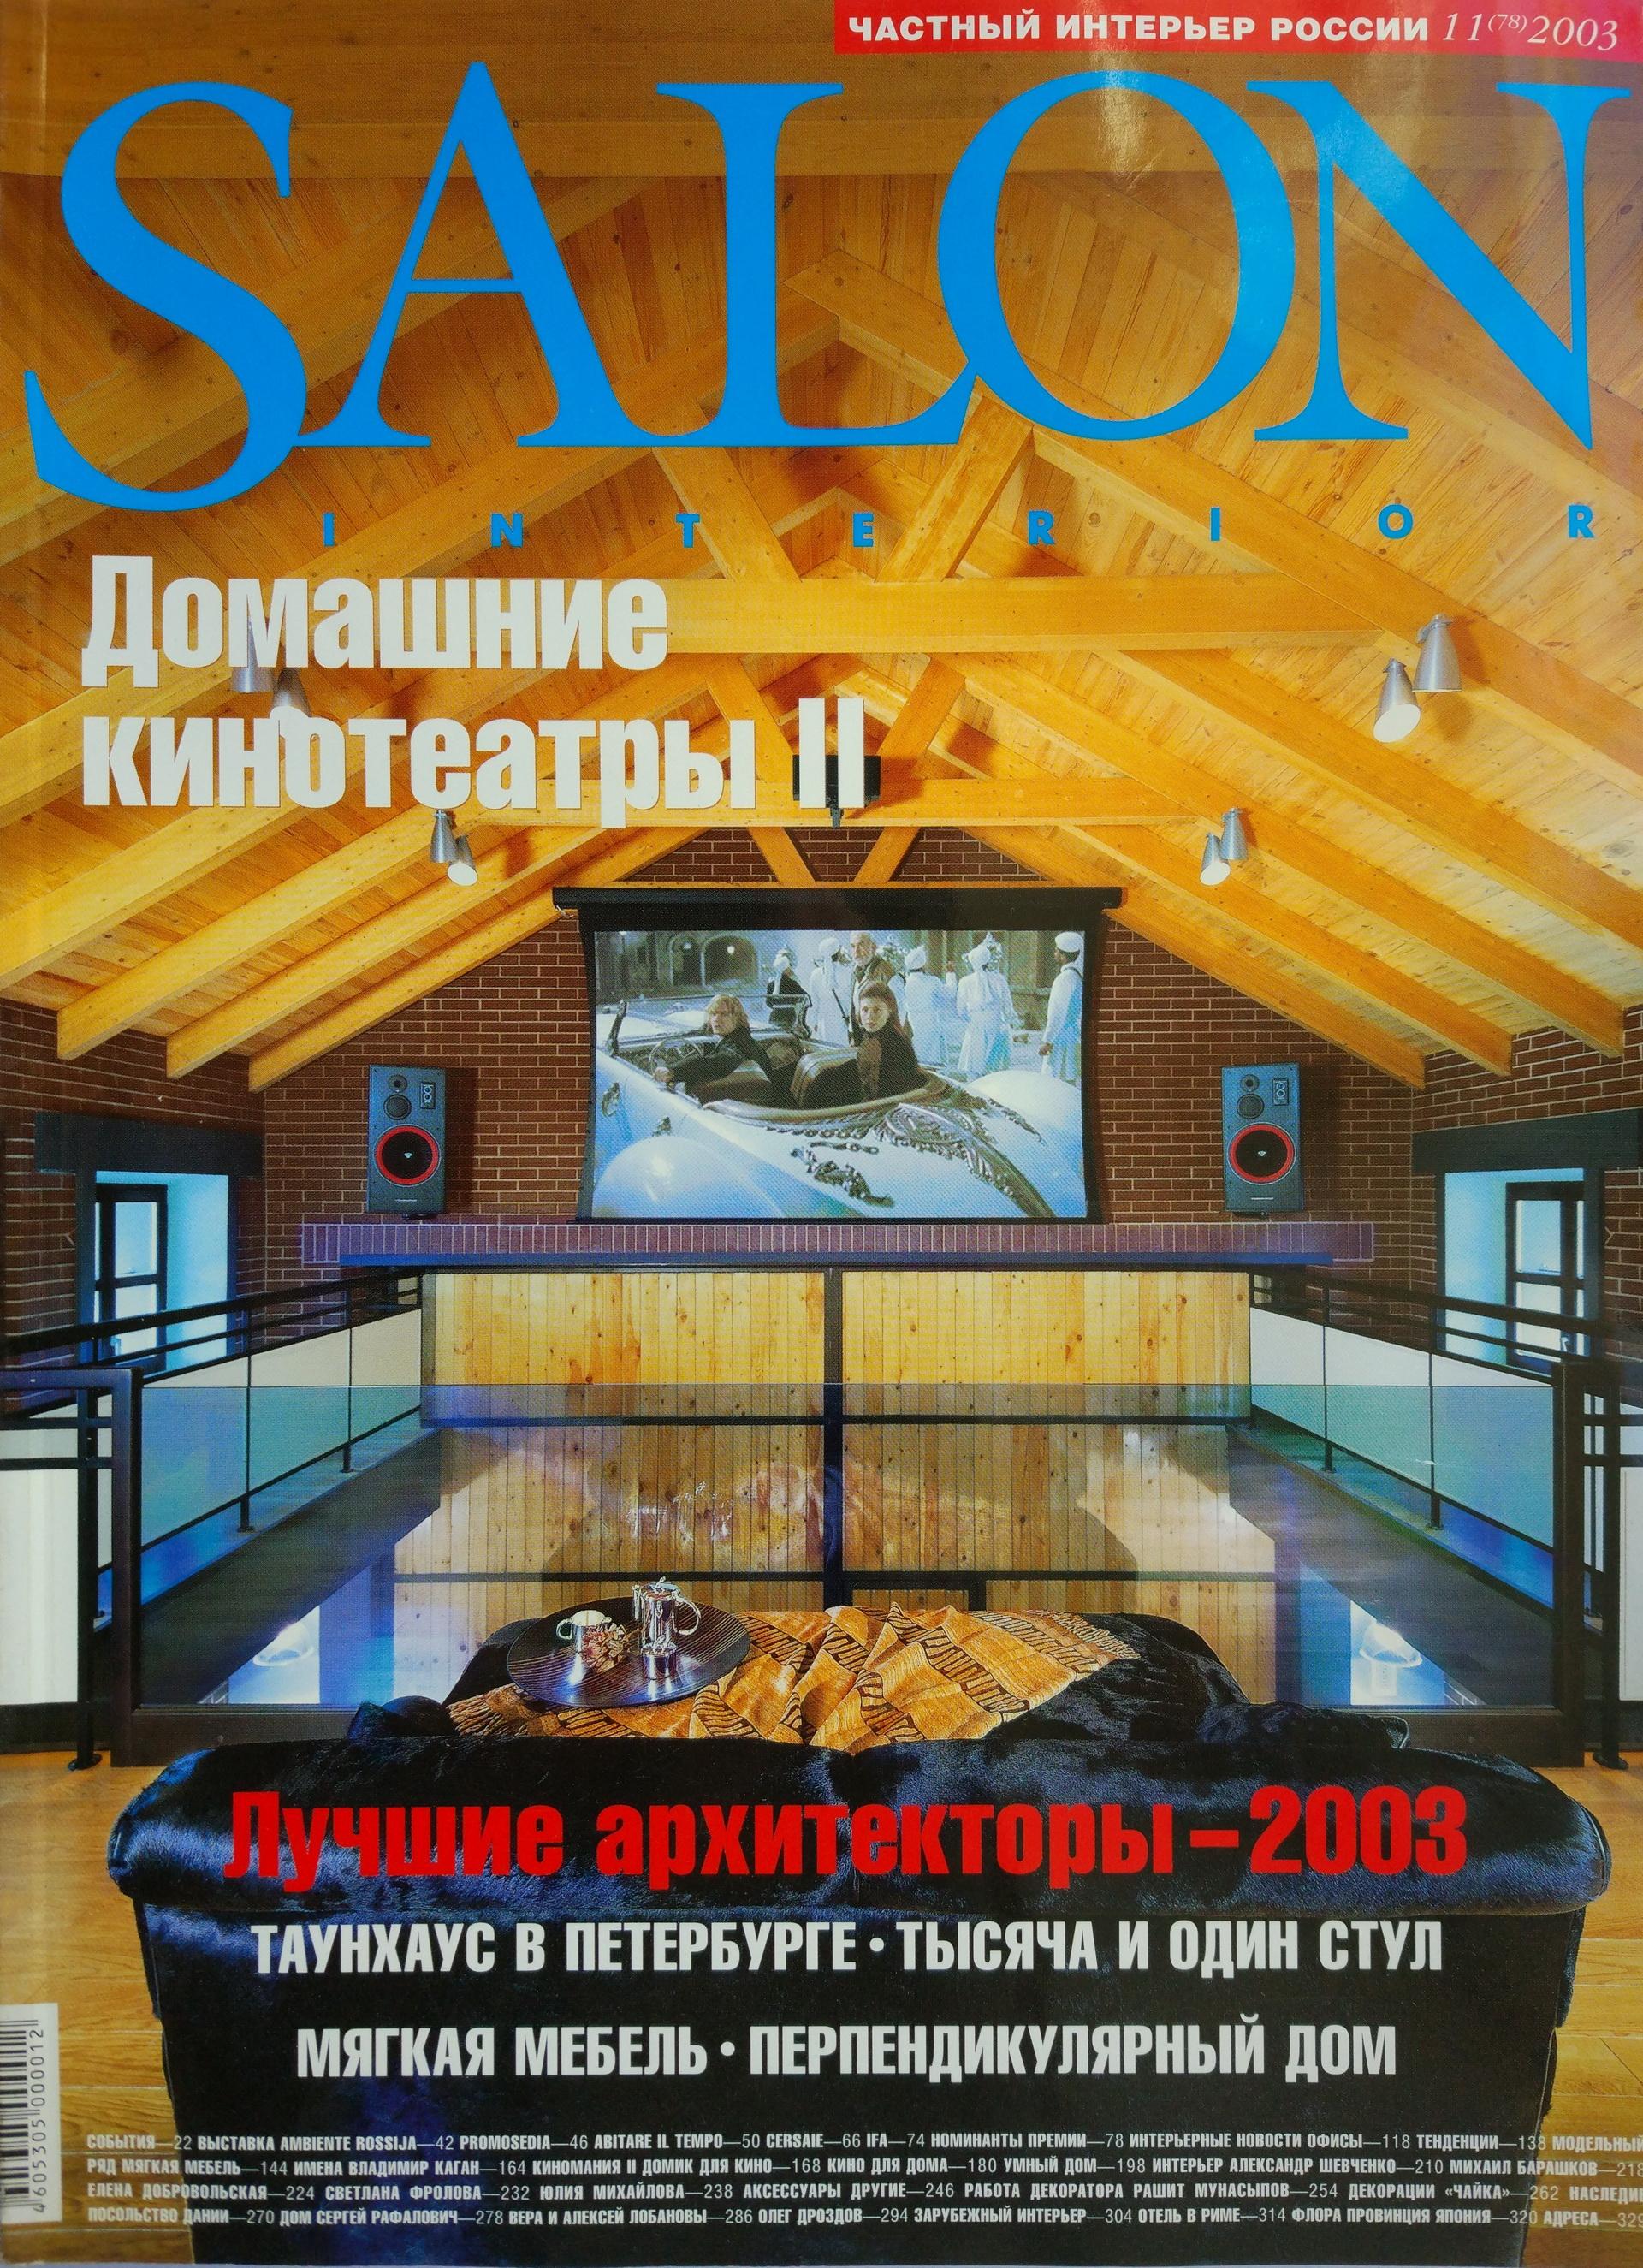 01-02_Salon_11-2003_ID-57-Штып